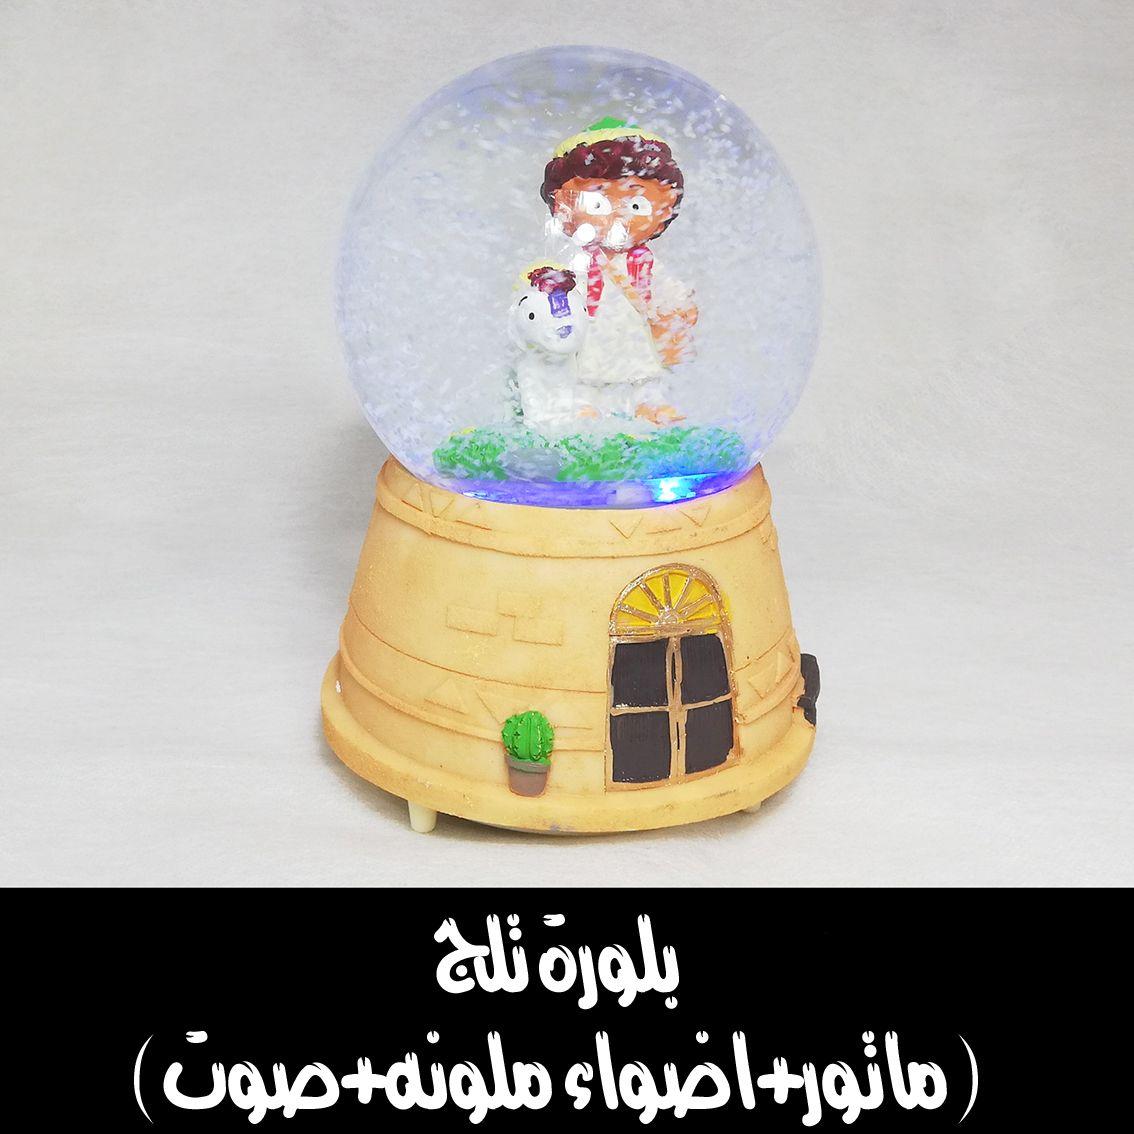 بلوره الثلج بكار ورشيده Snow Globes Home Decor Decor